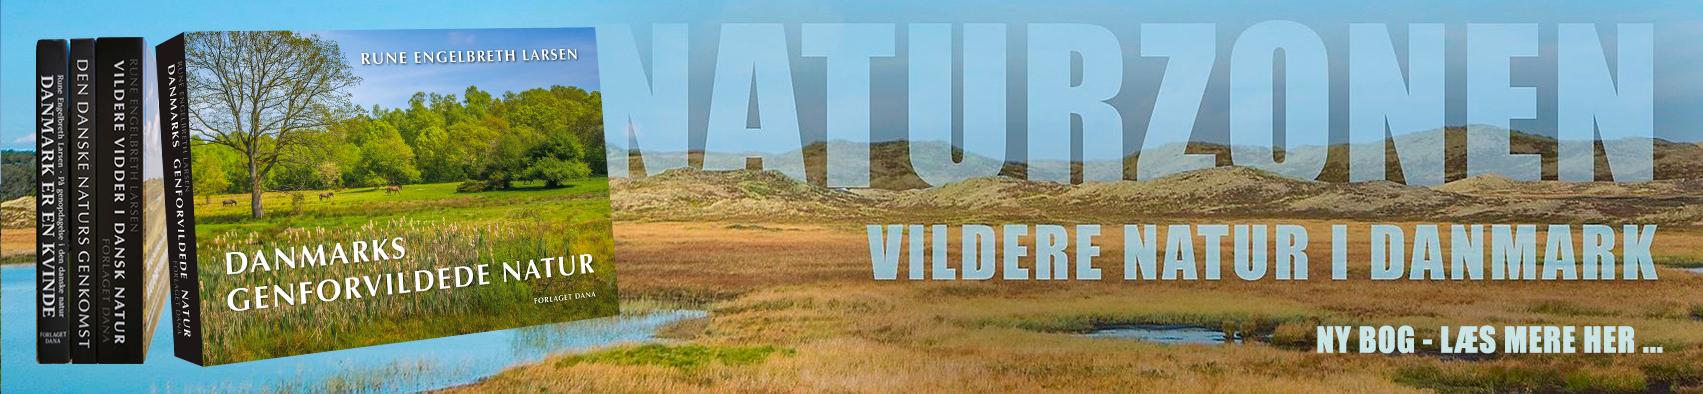 NY BOG: Danmarks genforvildede natur